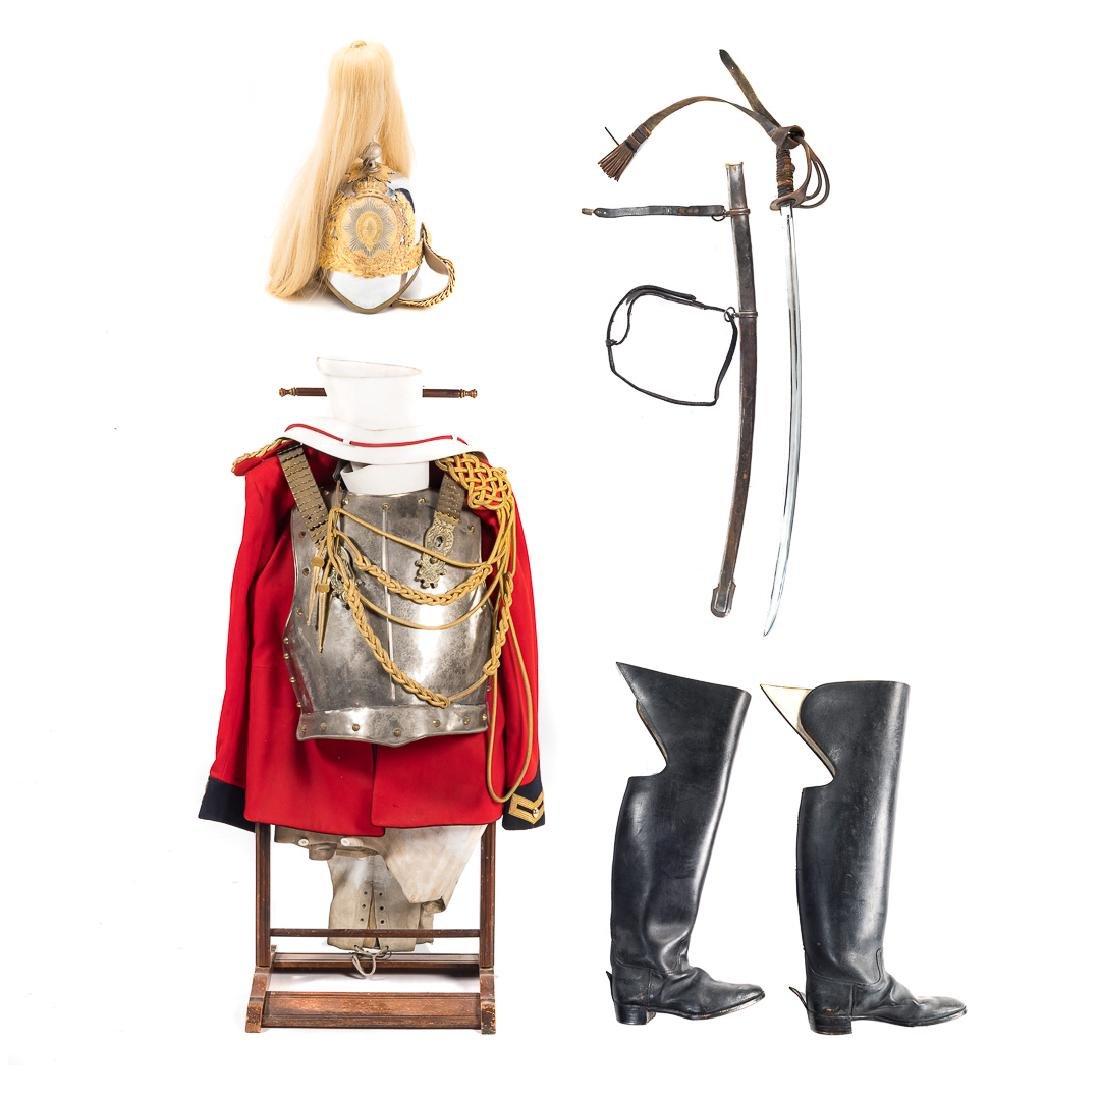 English Horse Guard items